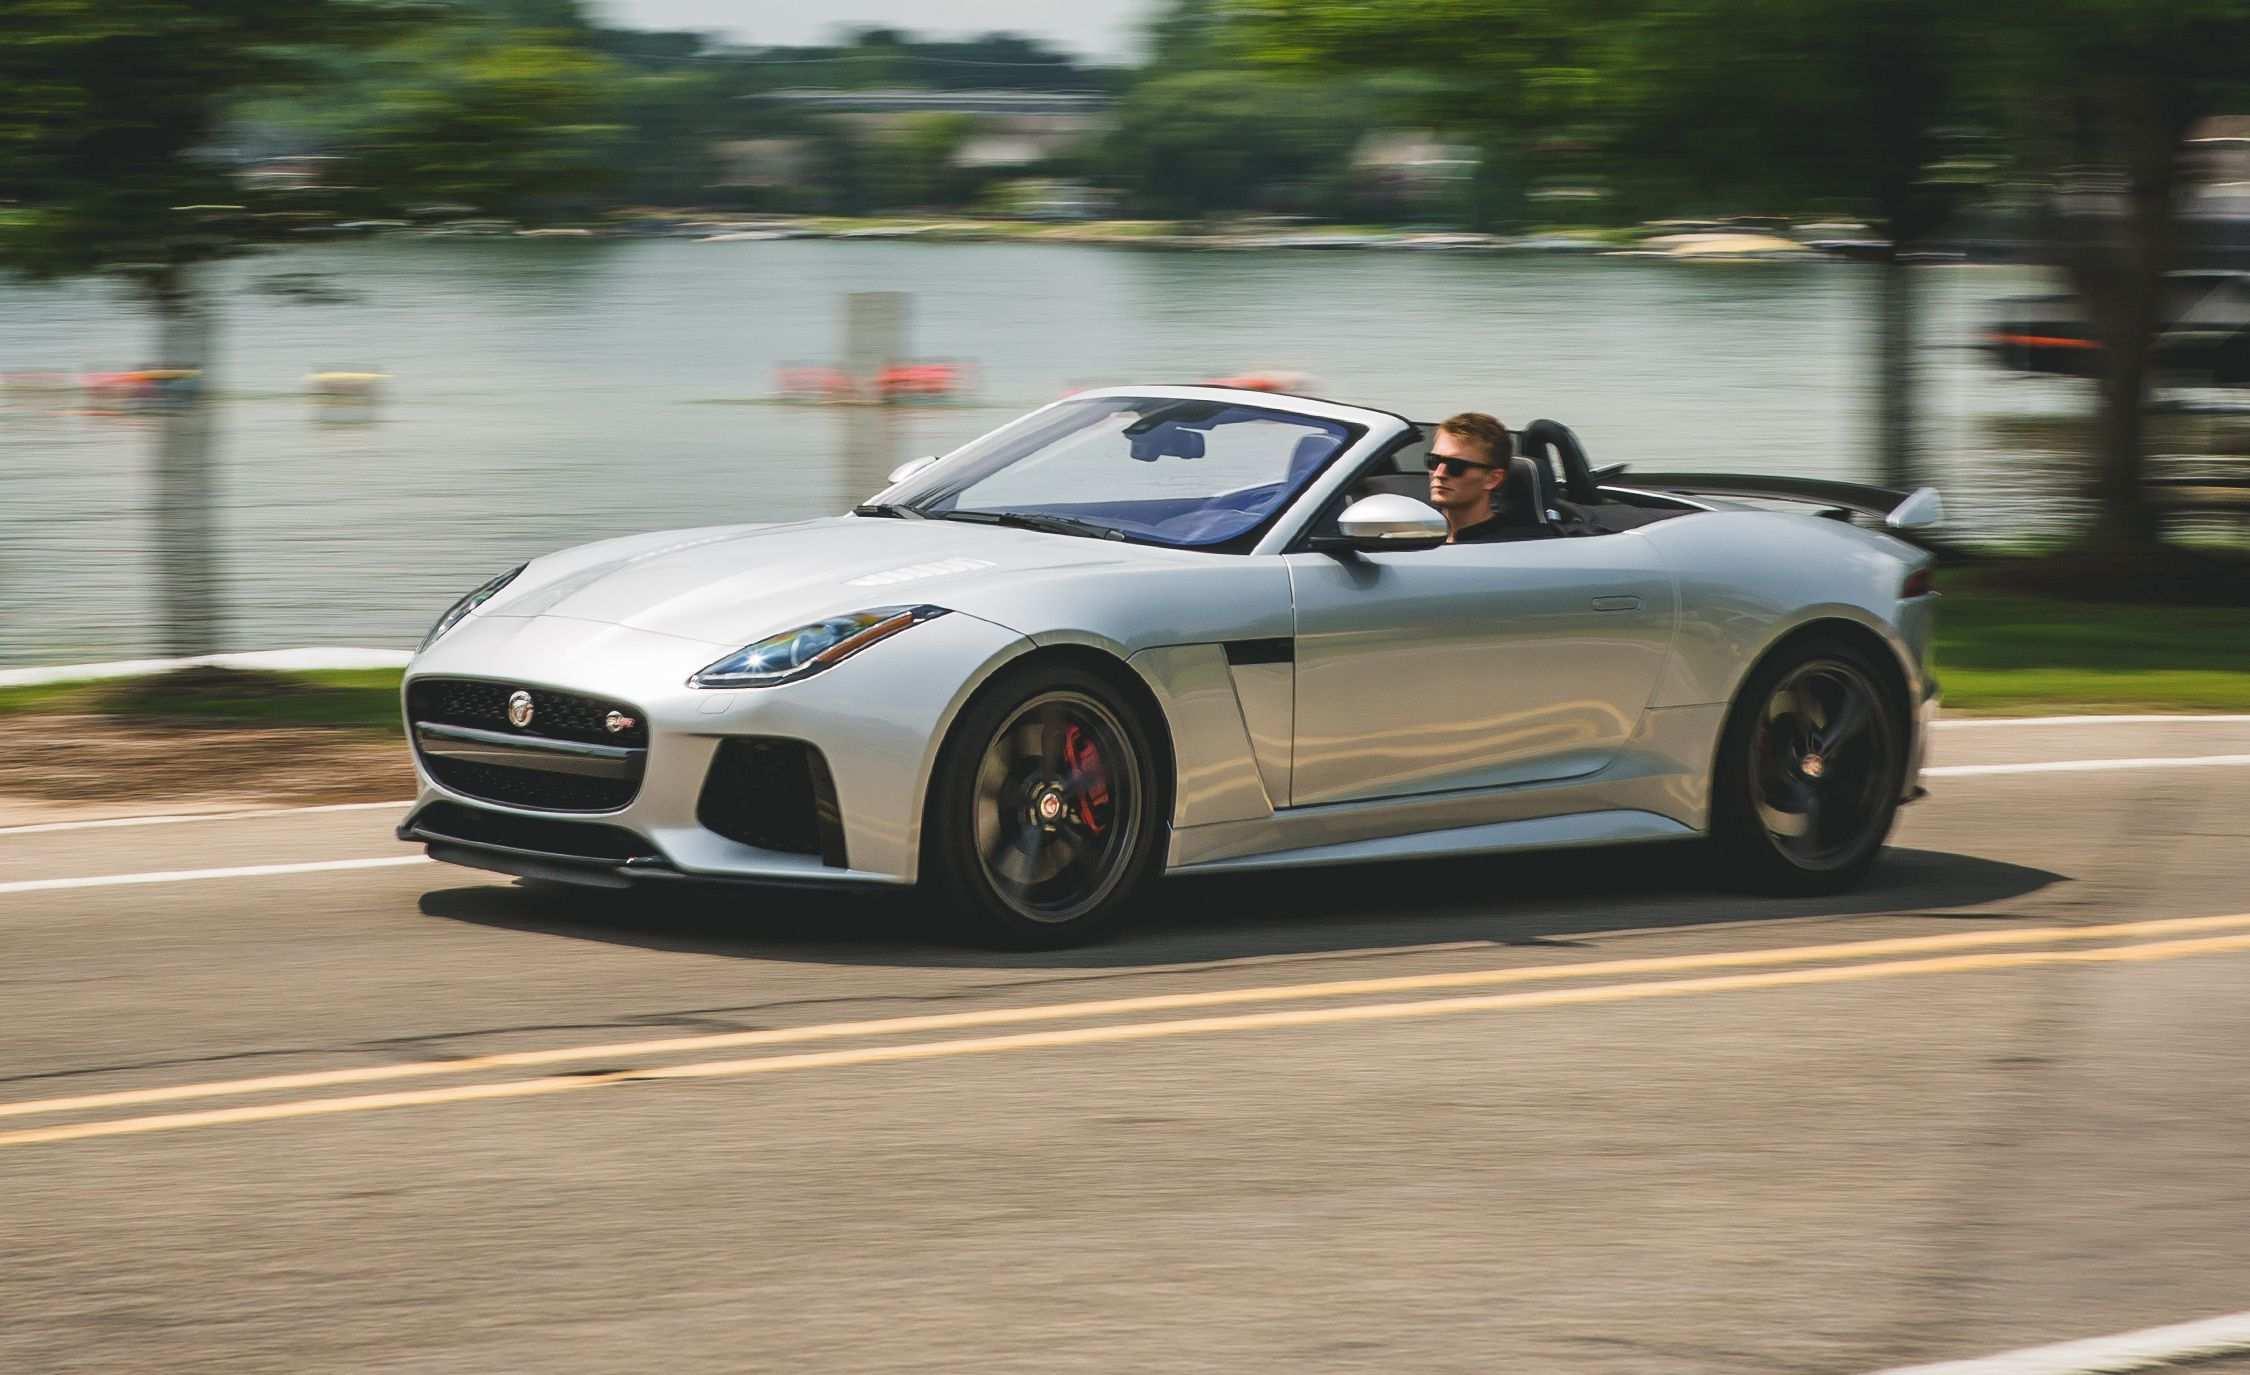 13 Gallery of Best 2019 Jaguar F Type Release Date Review And Release Date Price and Review by Best 2019 Jaguar F Type Release Date Review And Release Date